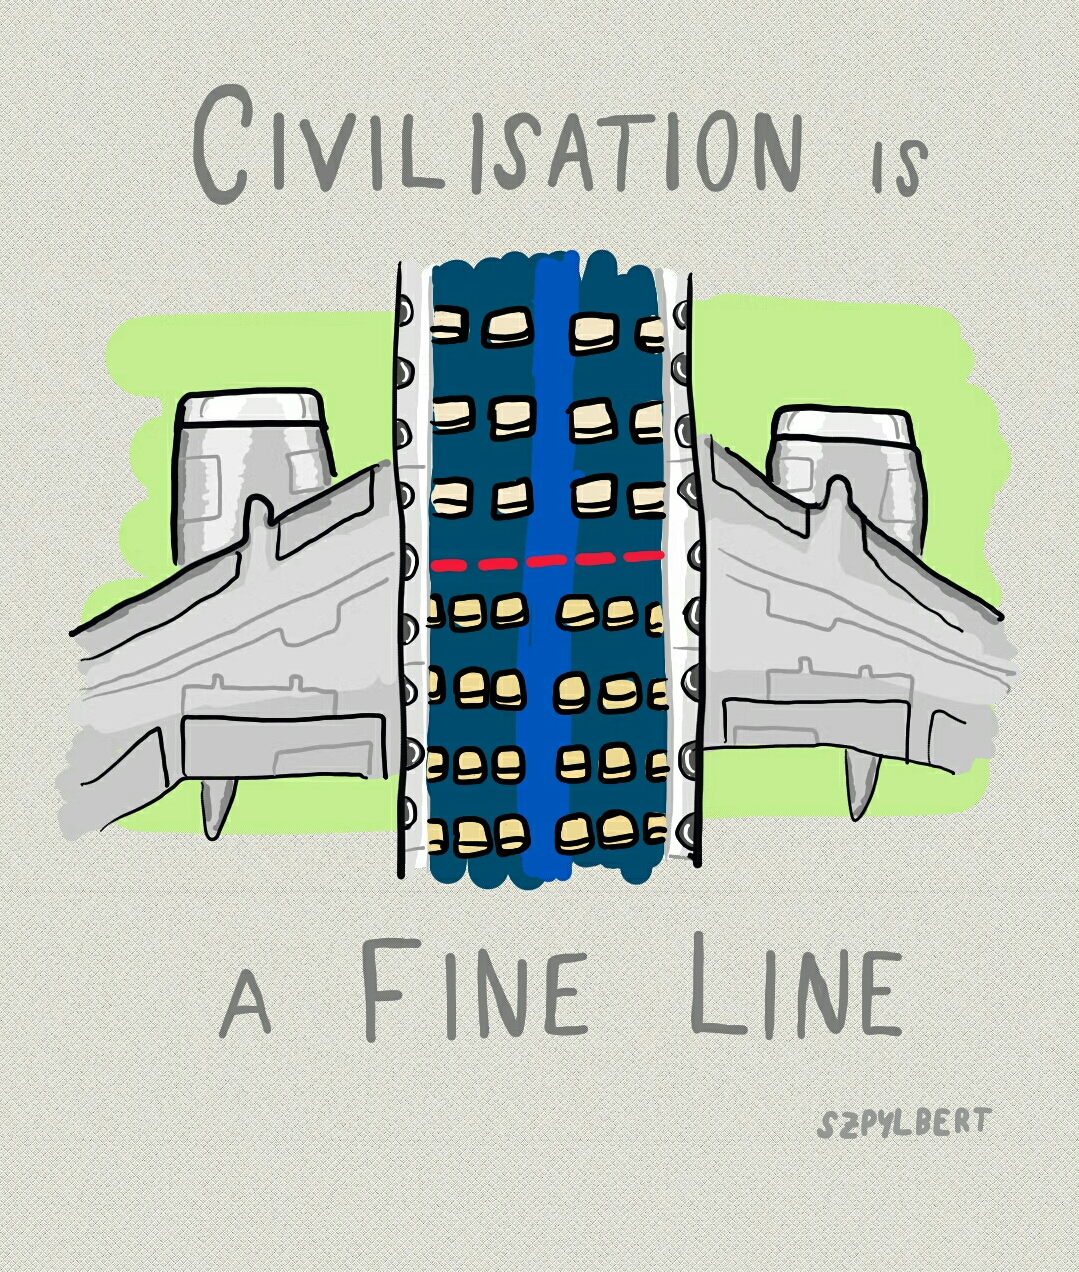 Szpylbert cartoon about the fine line of civilisation